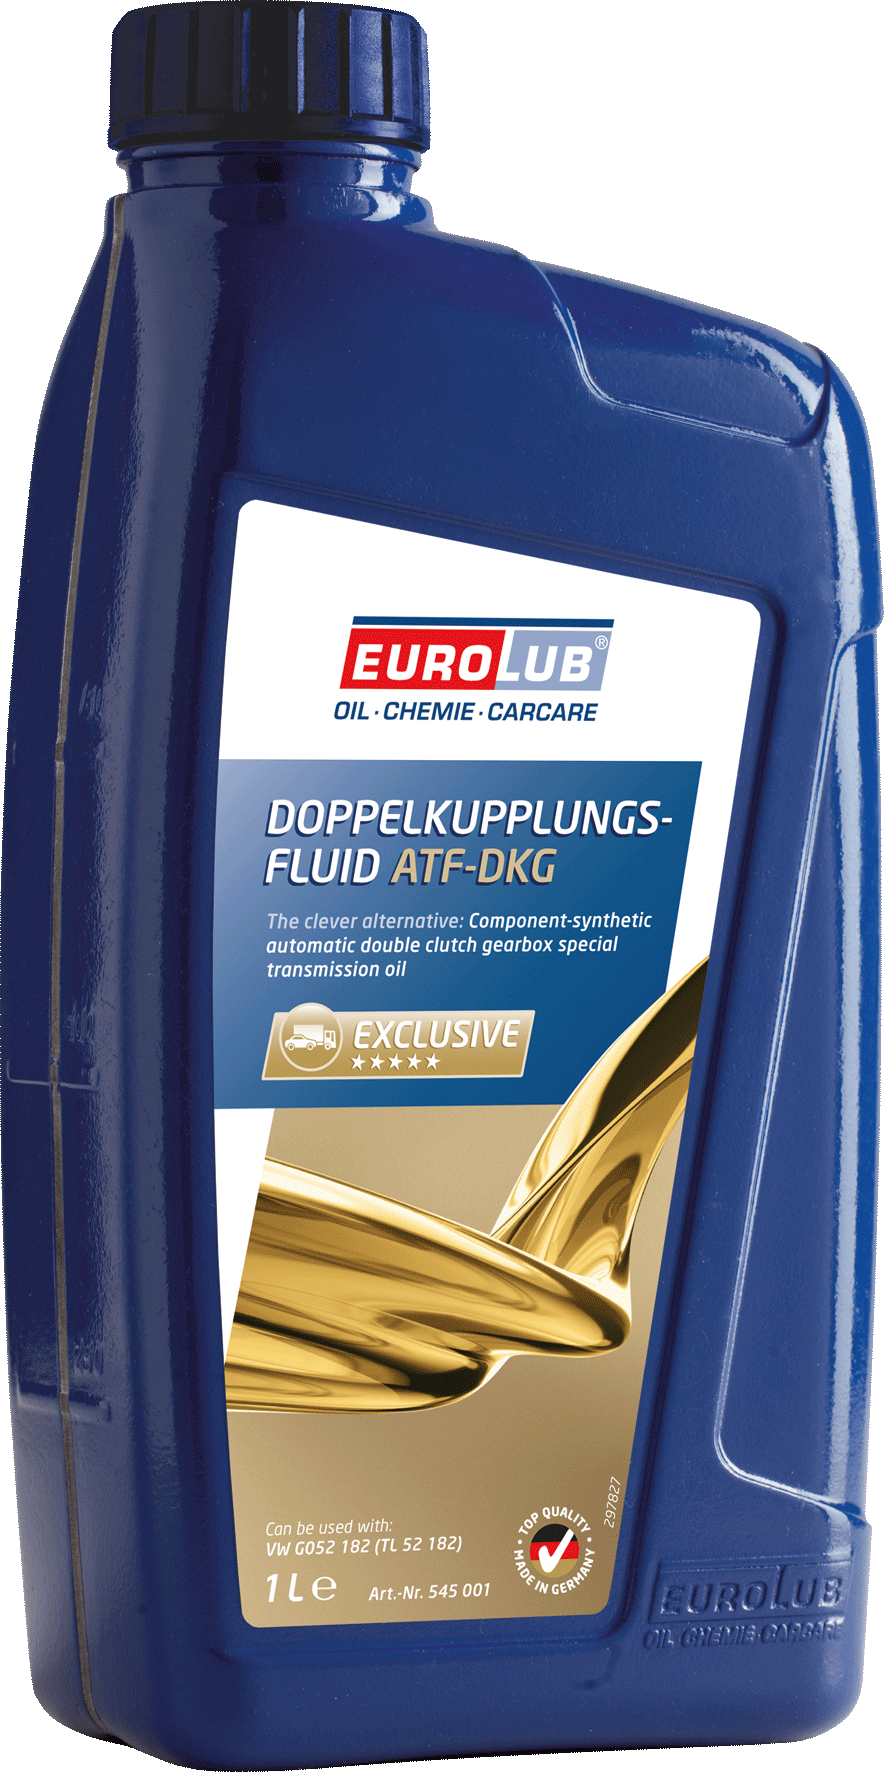 EUROLUB DOPPELKUPPLUNGS – FLUID (DKG) (для систем с двойным сцеплением), 1л